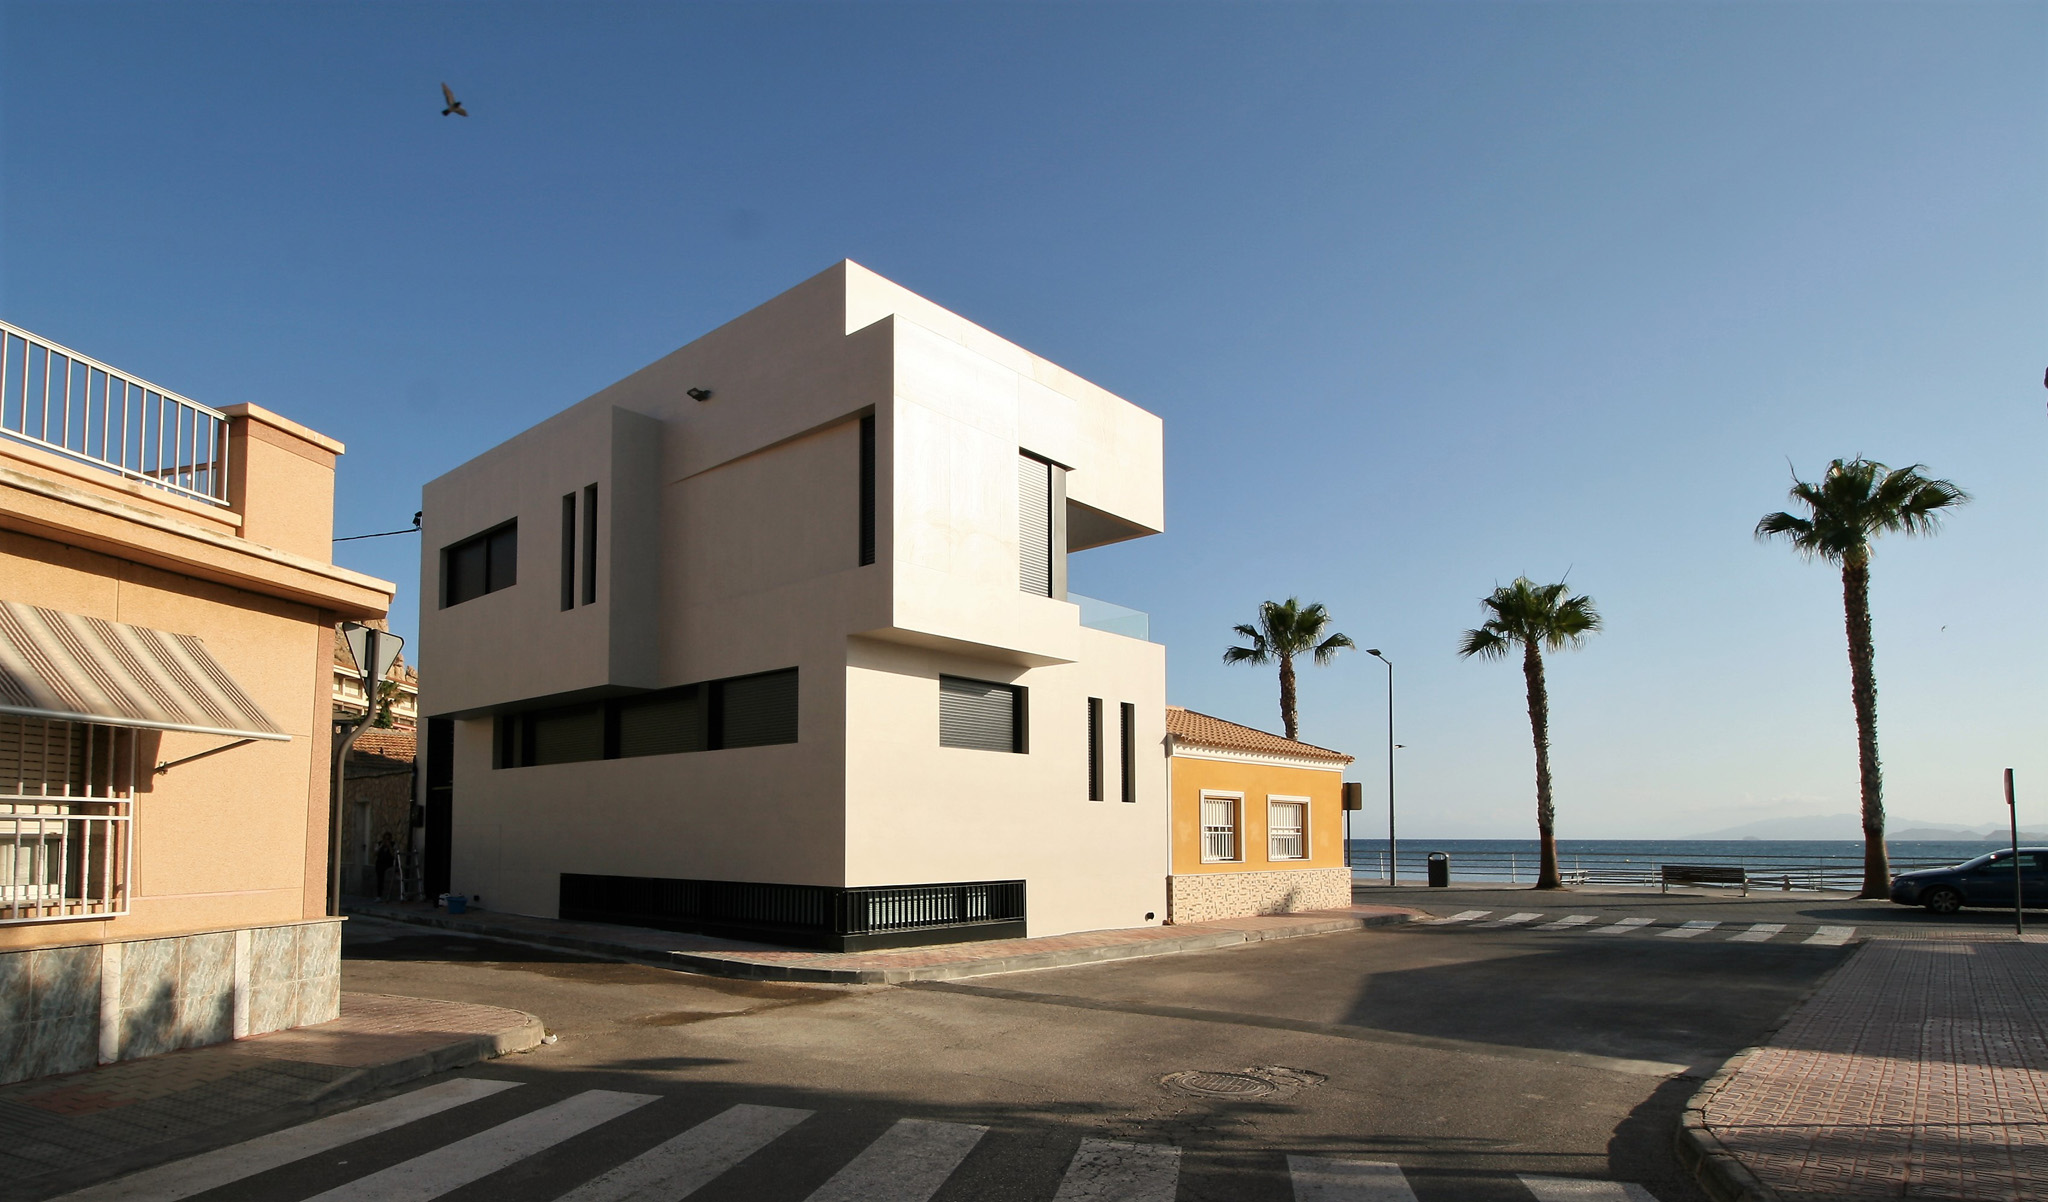 vivienda-fachada-moderna-playa